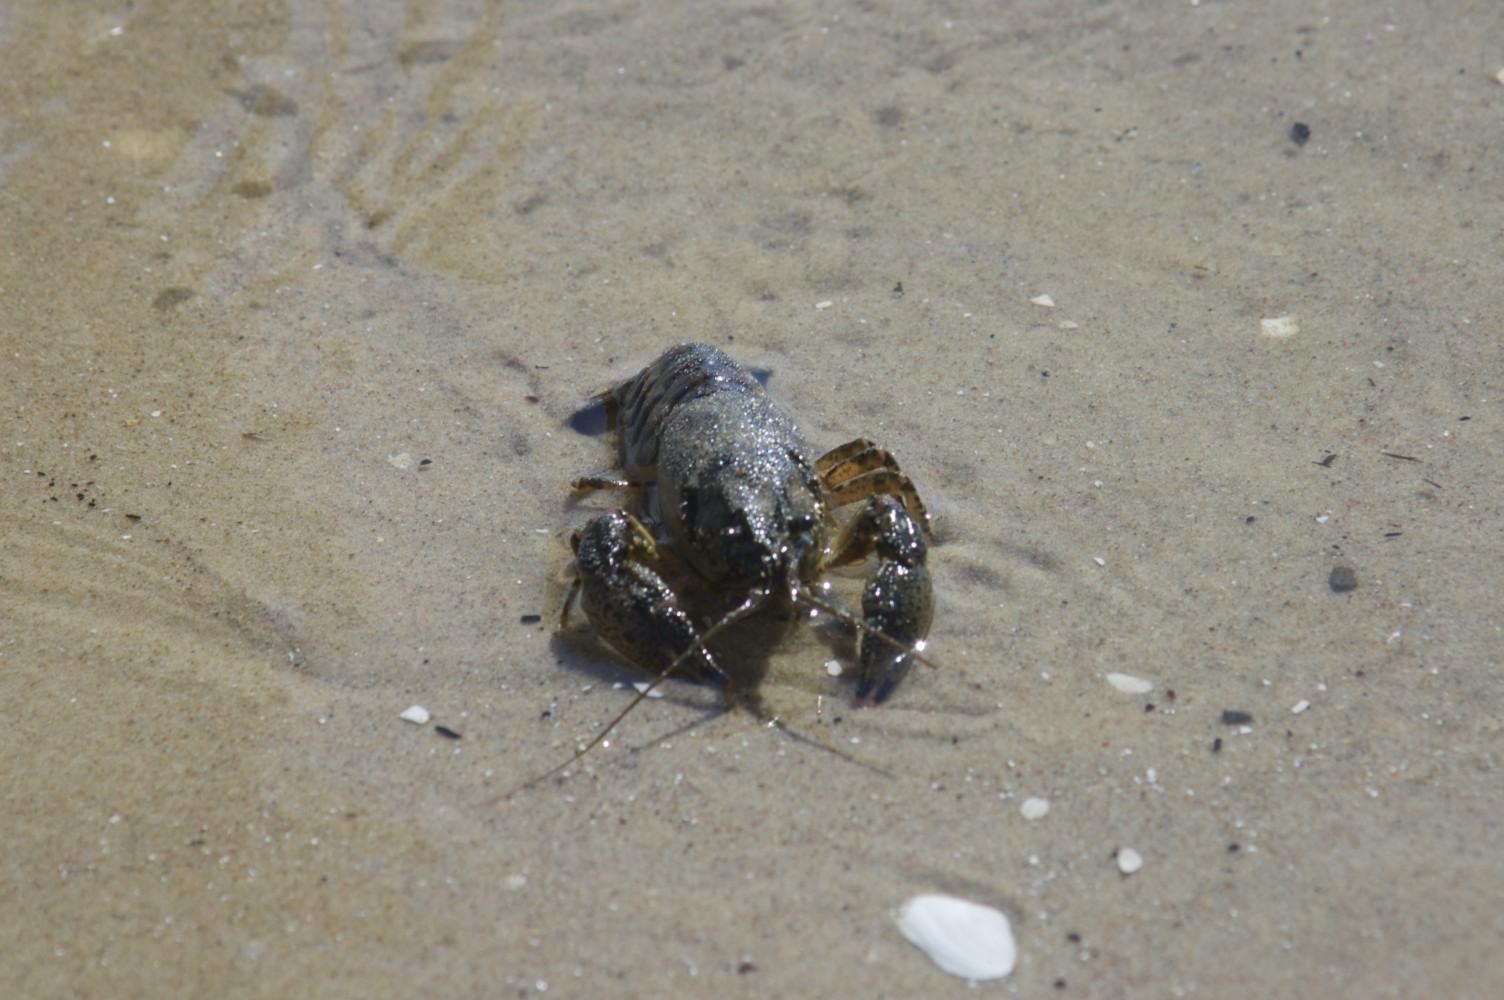 gesehen am Ahlbercker Strand